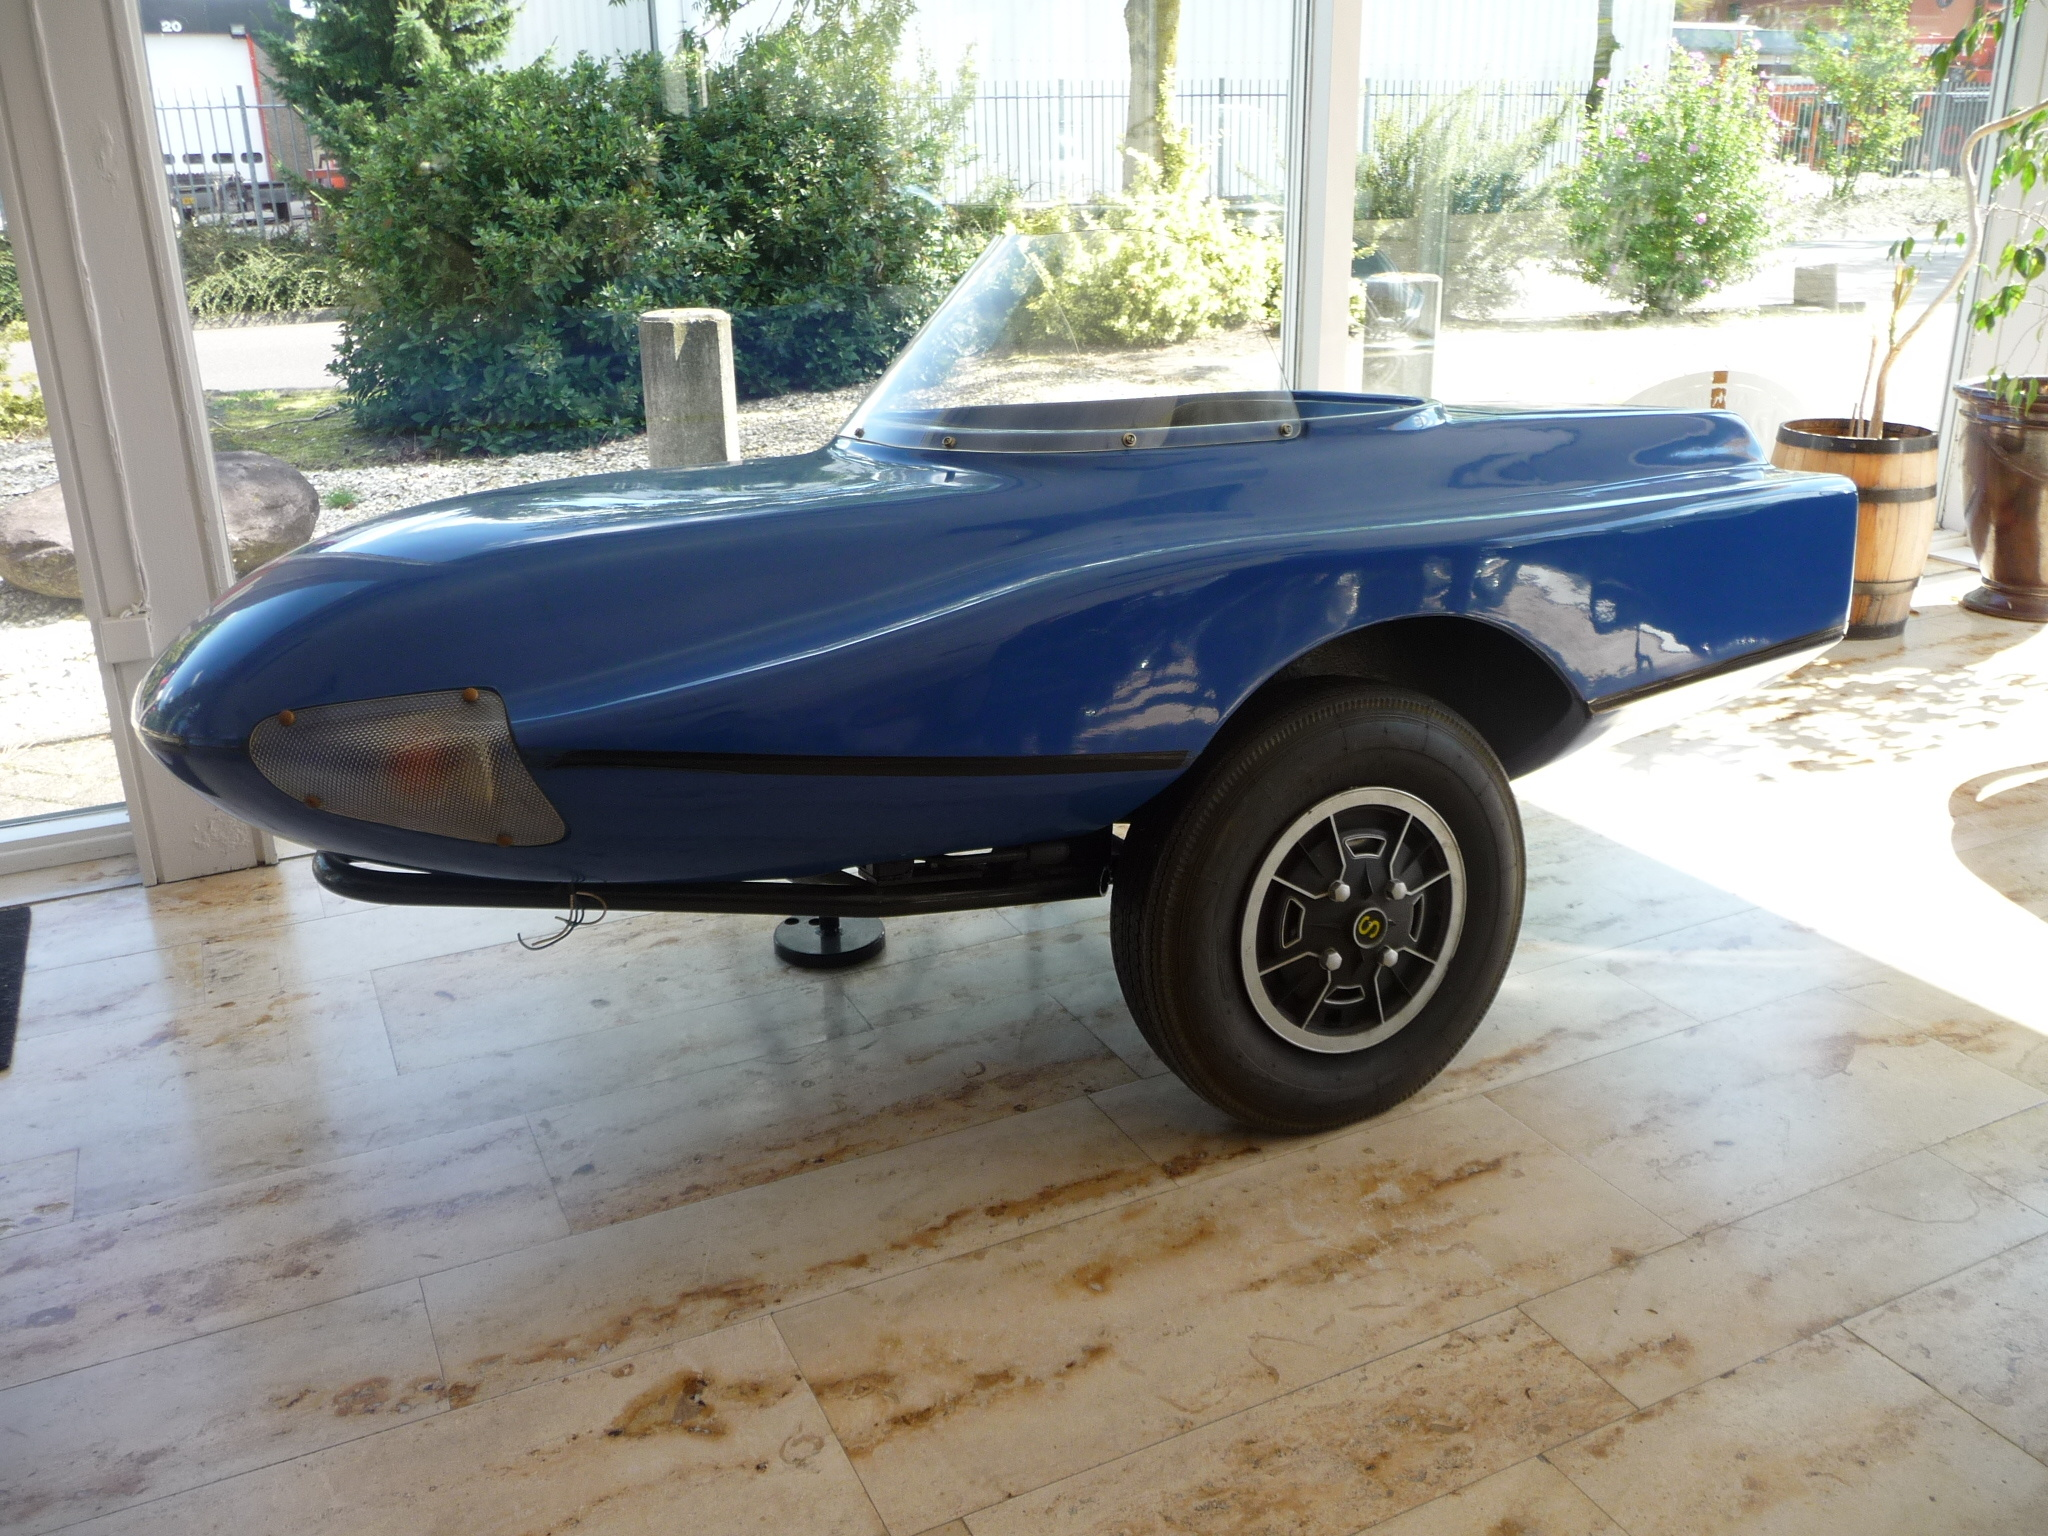 Triumph sports sidecar (LH)